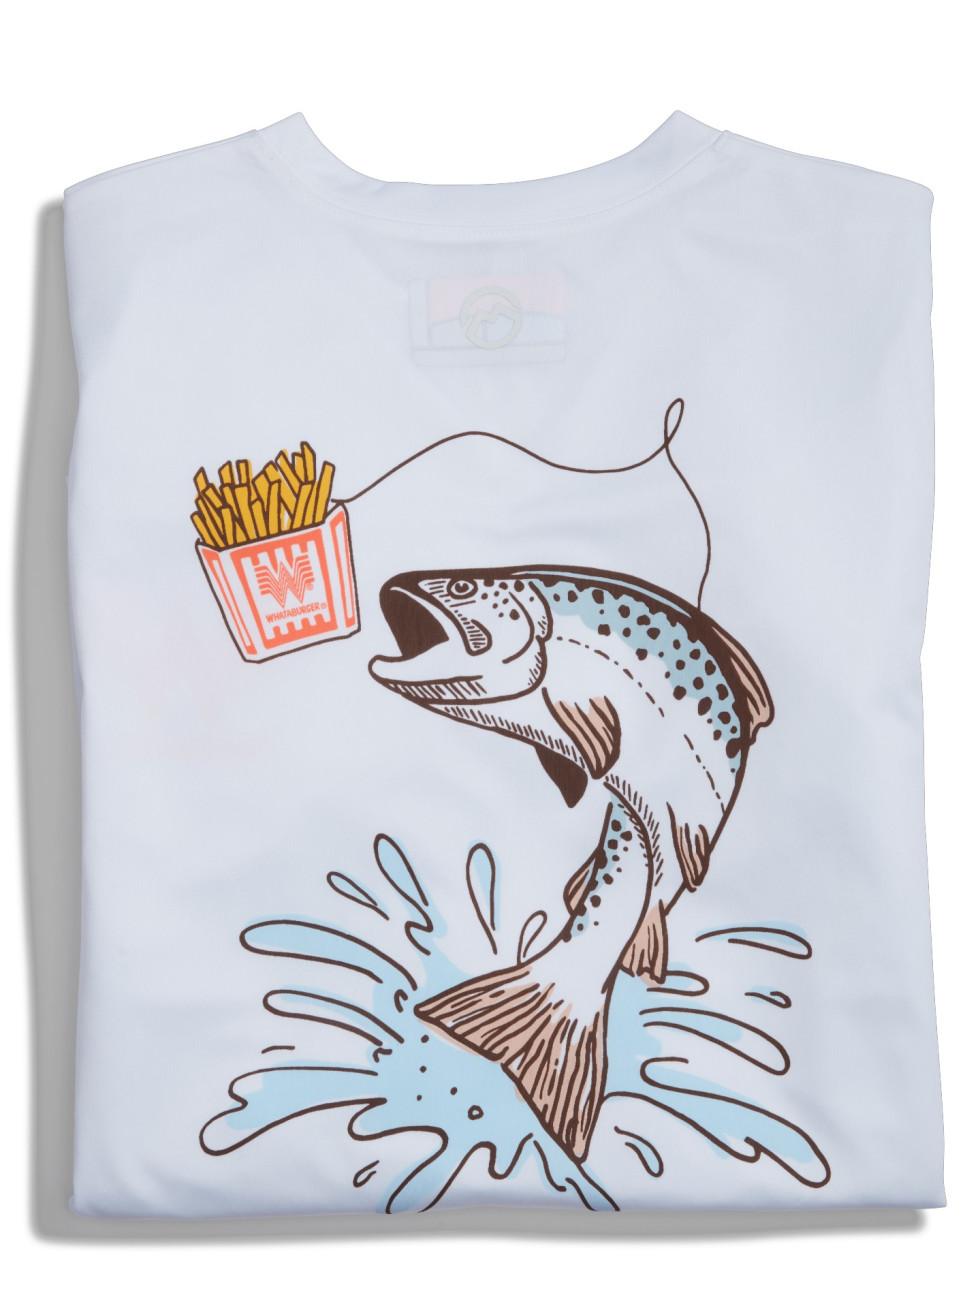 Whataburger Academy clothing line T-shirt